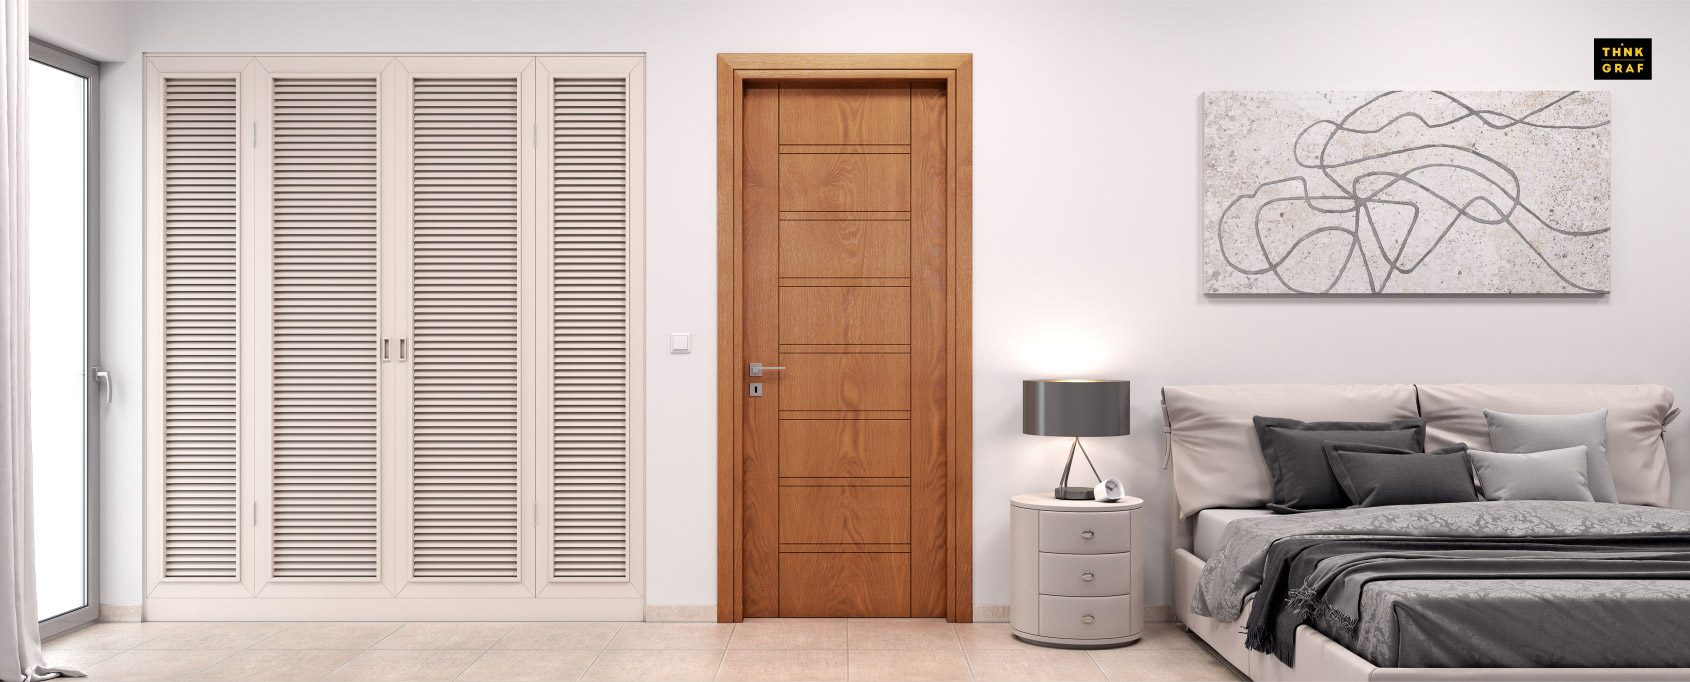 Coverdoors πόρτες τρισδιάστατος σχεδιασμός & φωτορεαλισμός